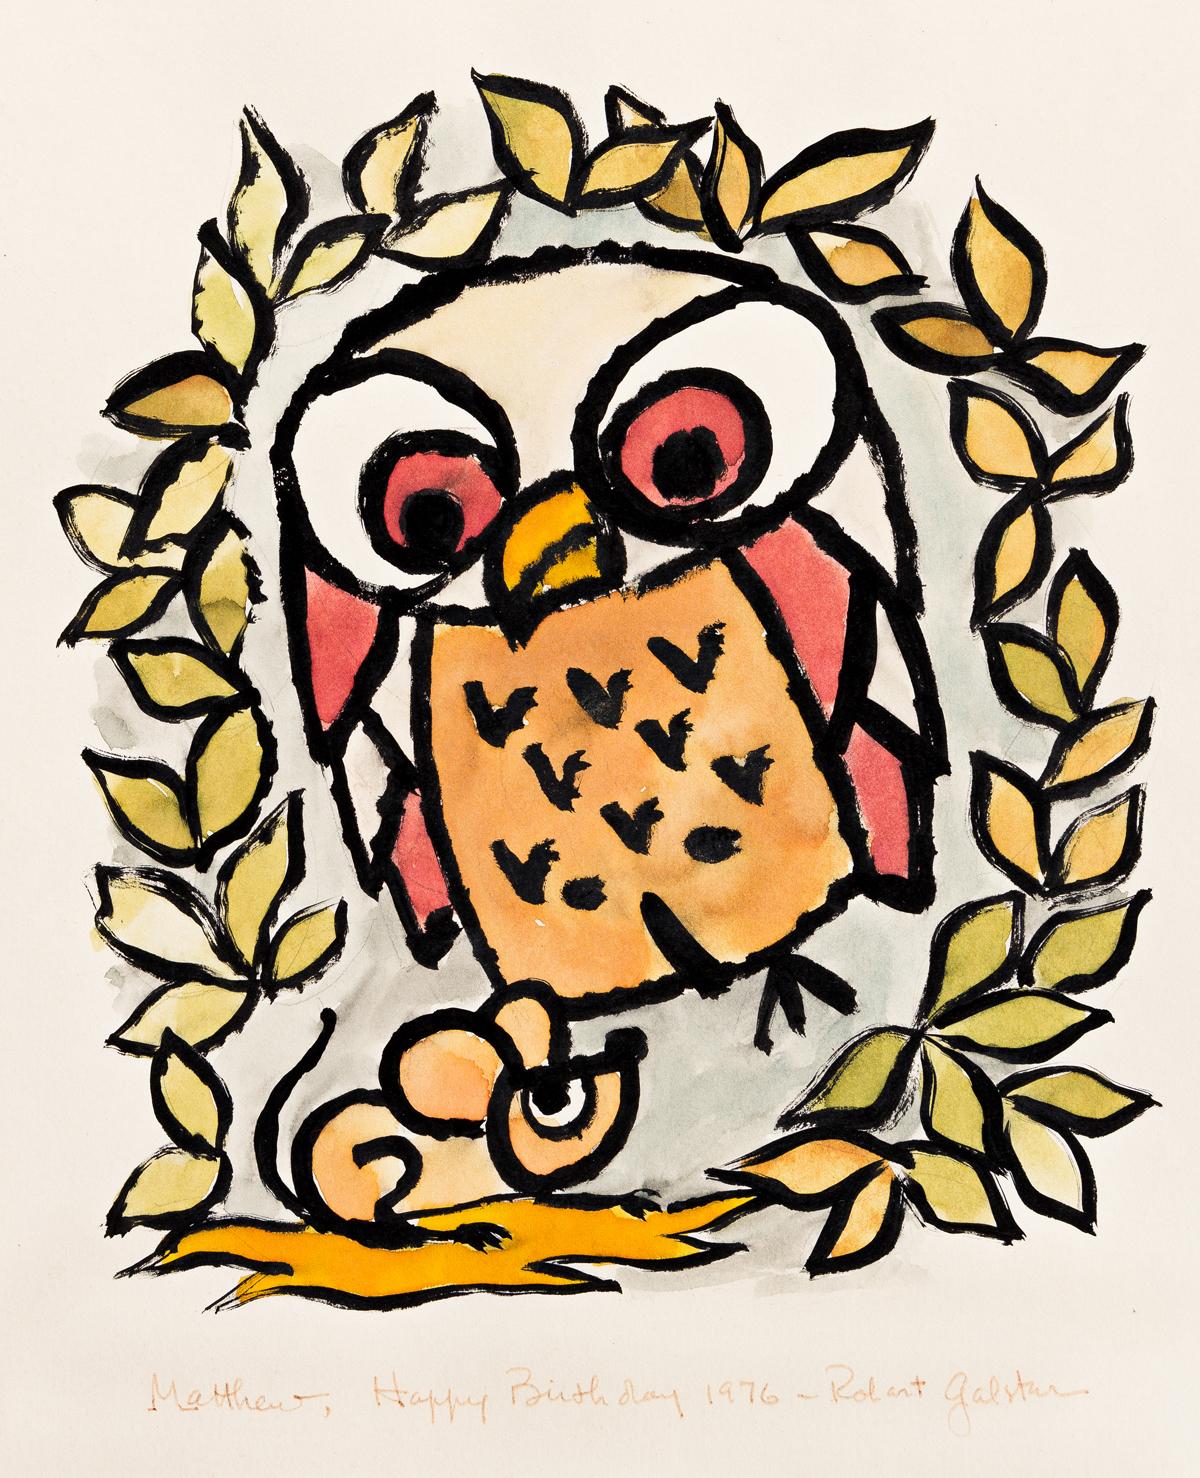 (CHILDREN'S BOOK ILLUSTRATORS) Group of 9 original illustrations.